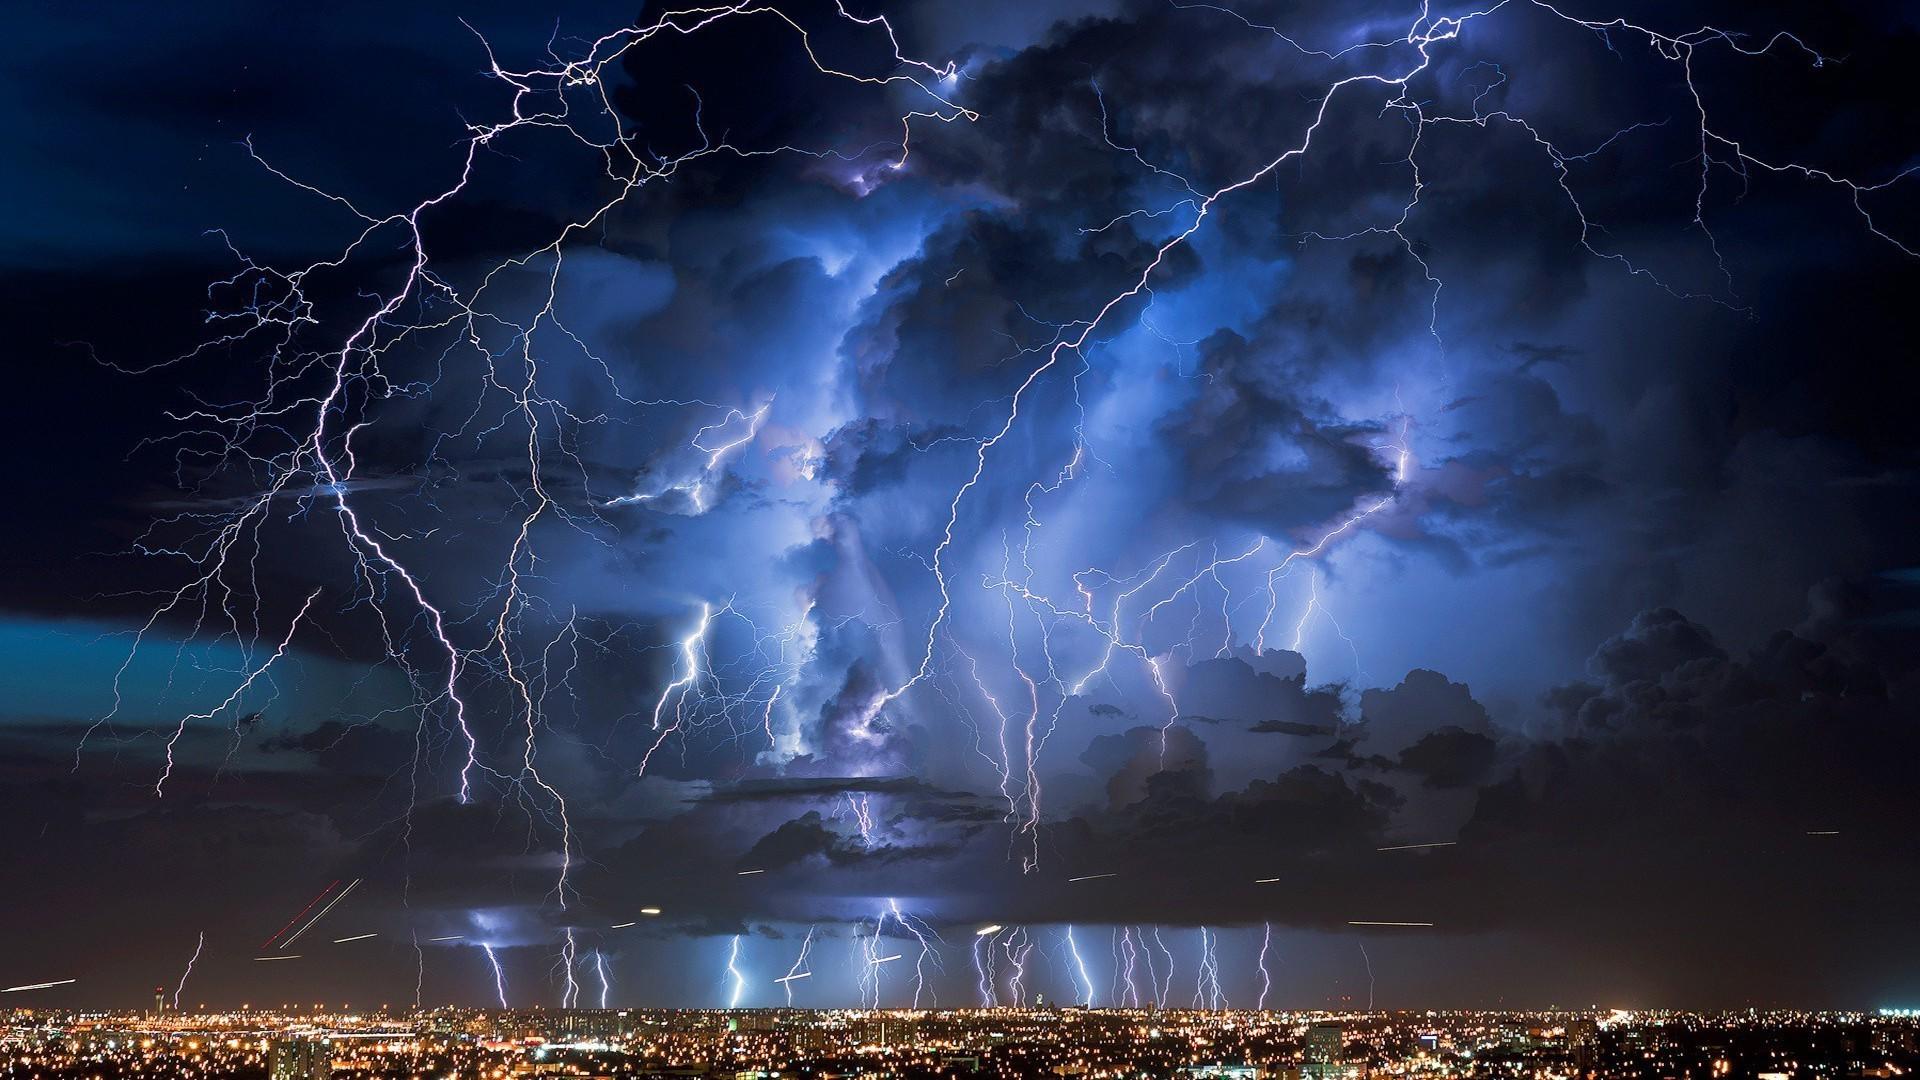 thunderbolt wallpaper size - photo #38